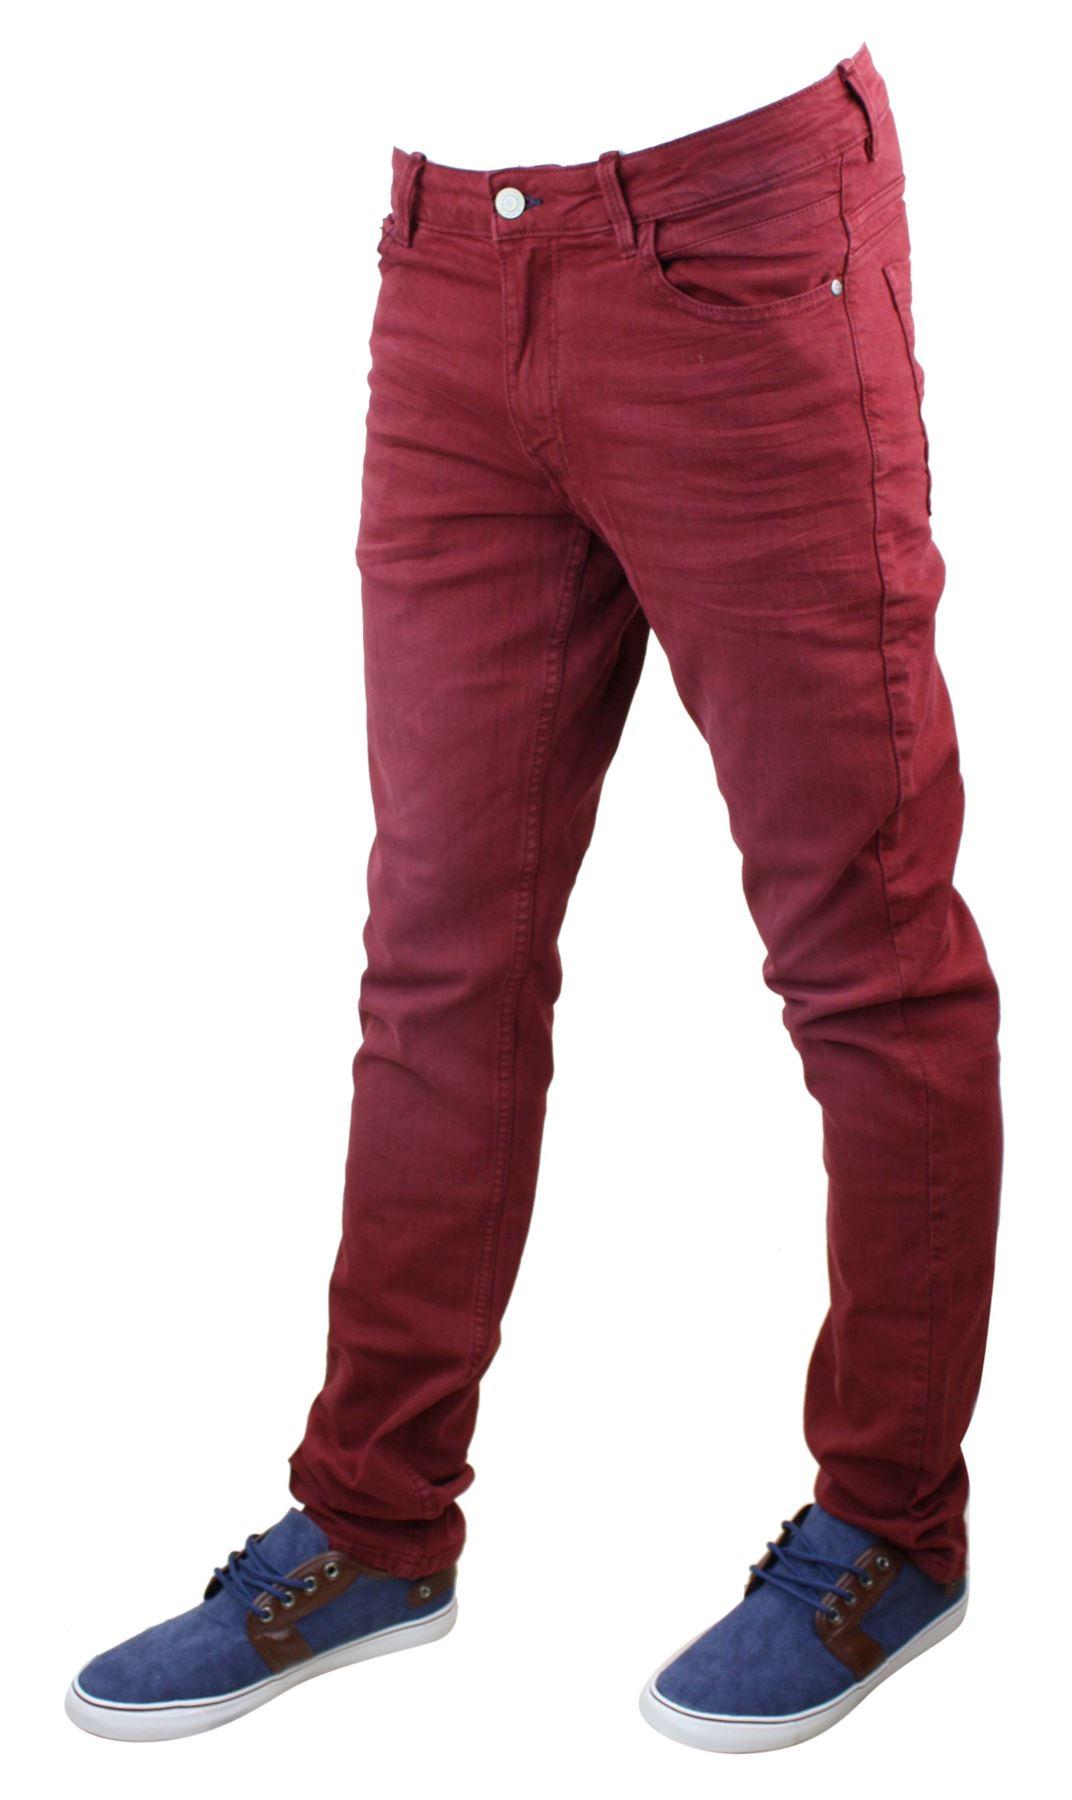 Mens Denim Skinny Stretch Slim Fit Jeans All Waist Sizes